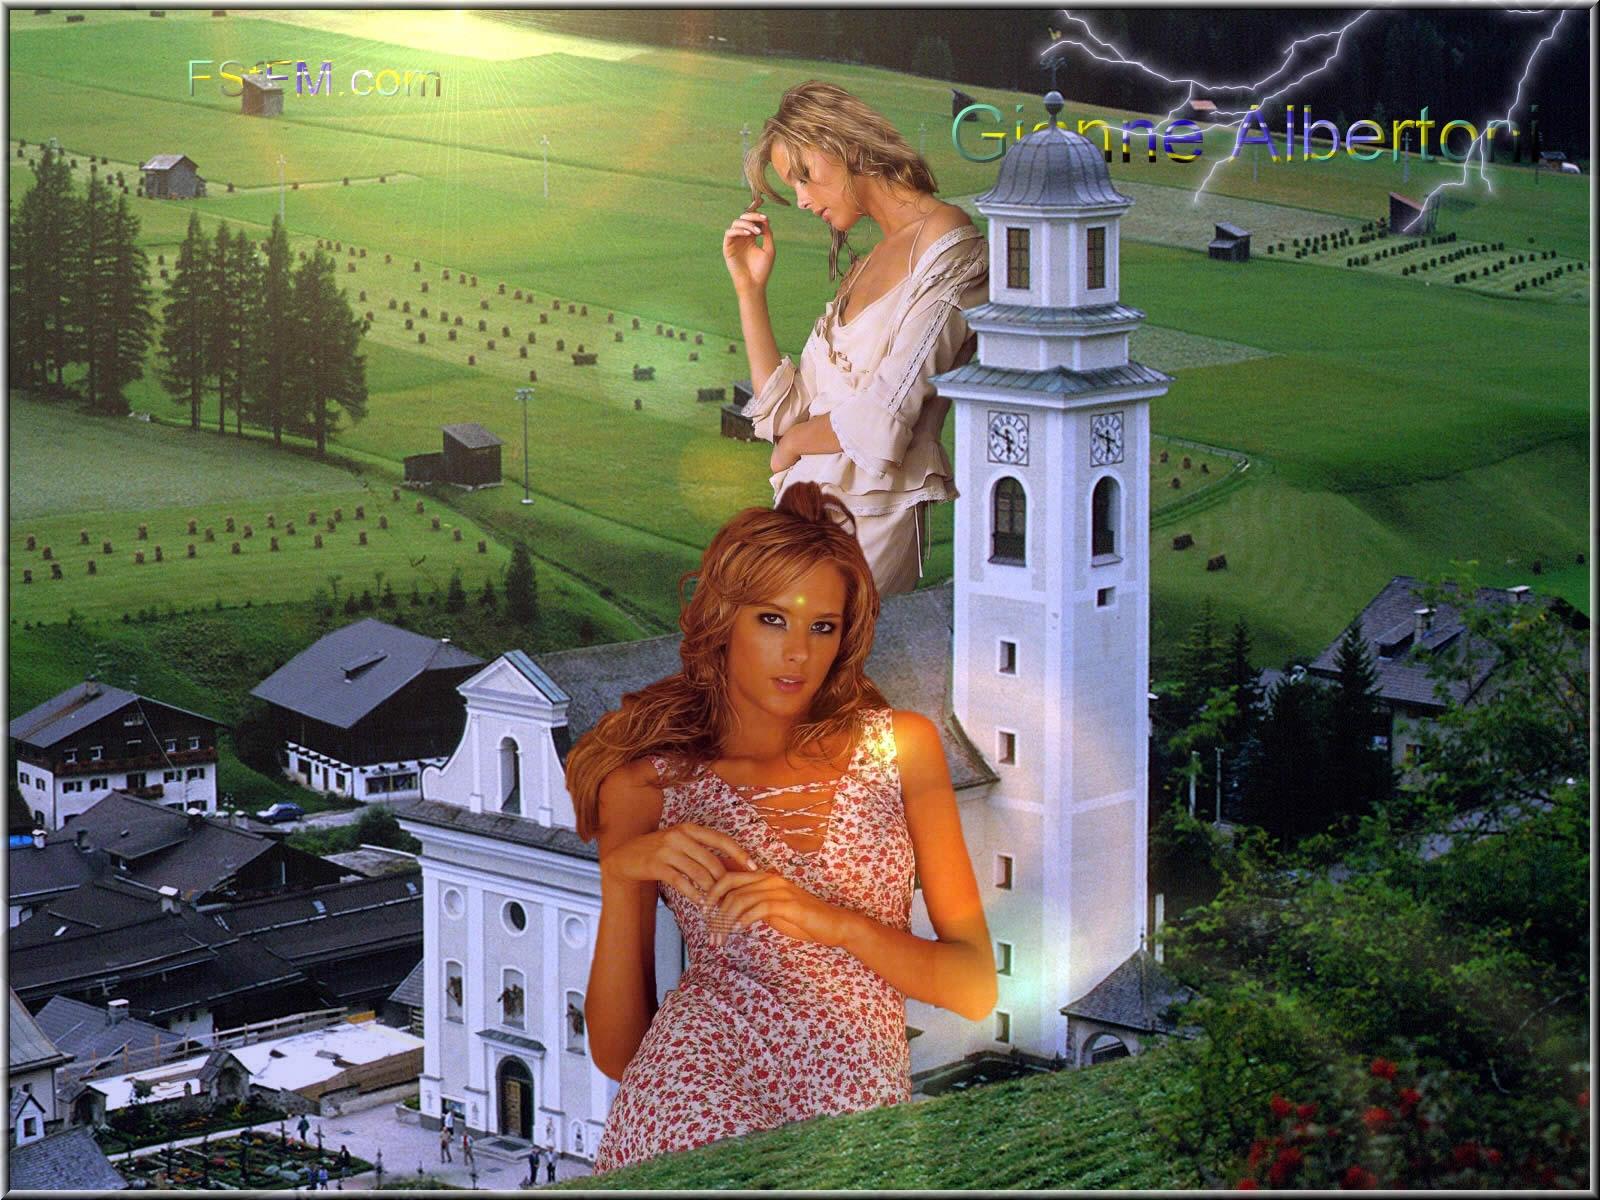 Gianne albertoni 1